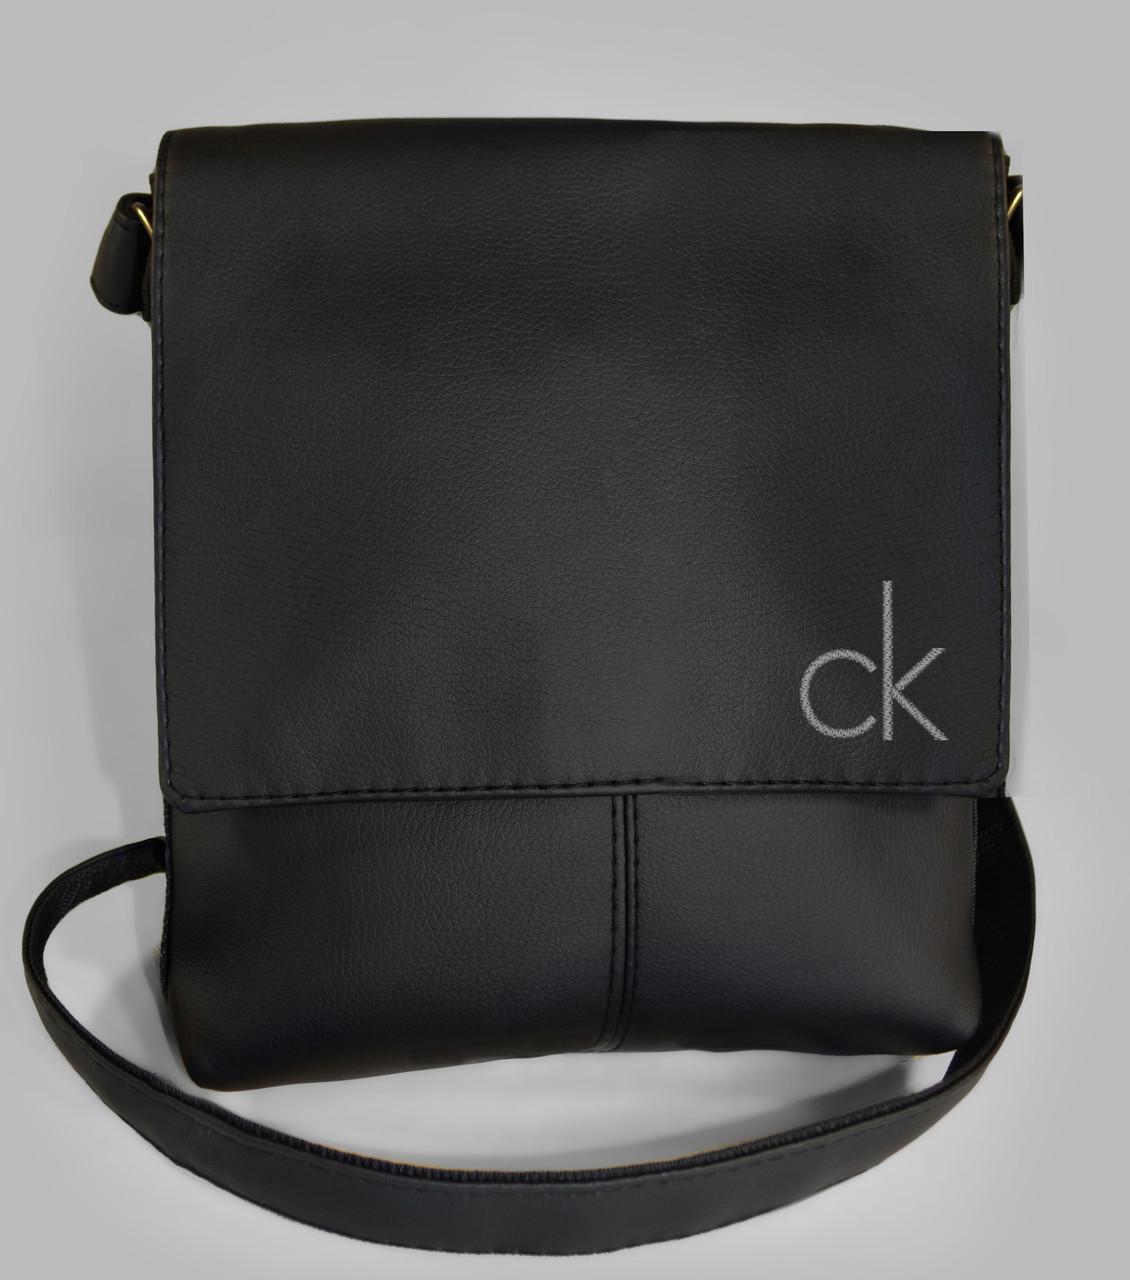 cb23c4ba1a8f Мужская сумка